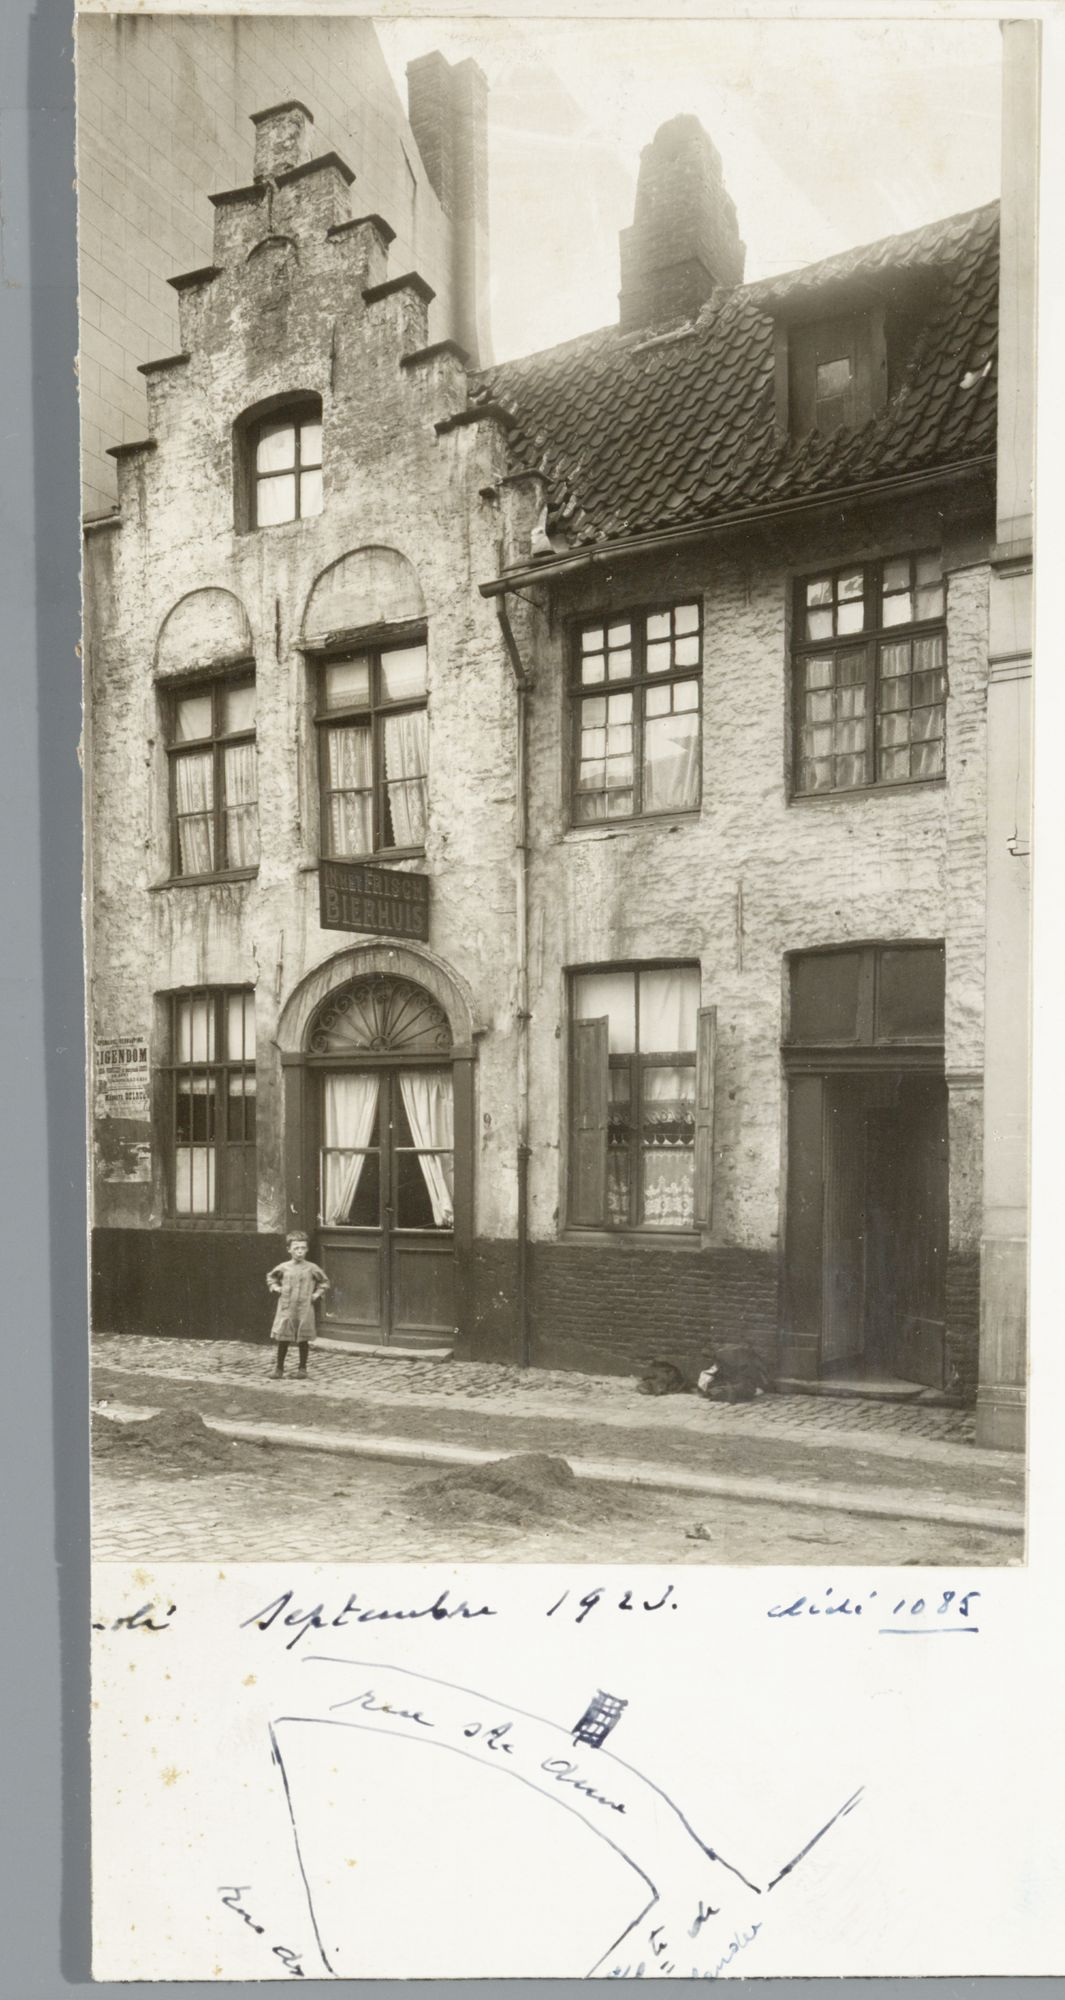 Gent: Trapgevelhuis, Sint-Annastraat